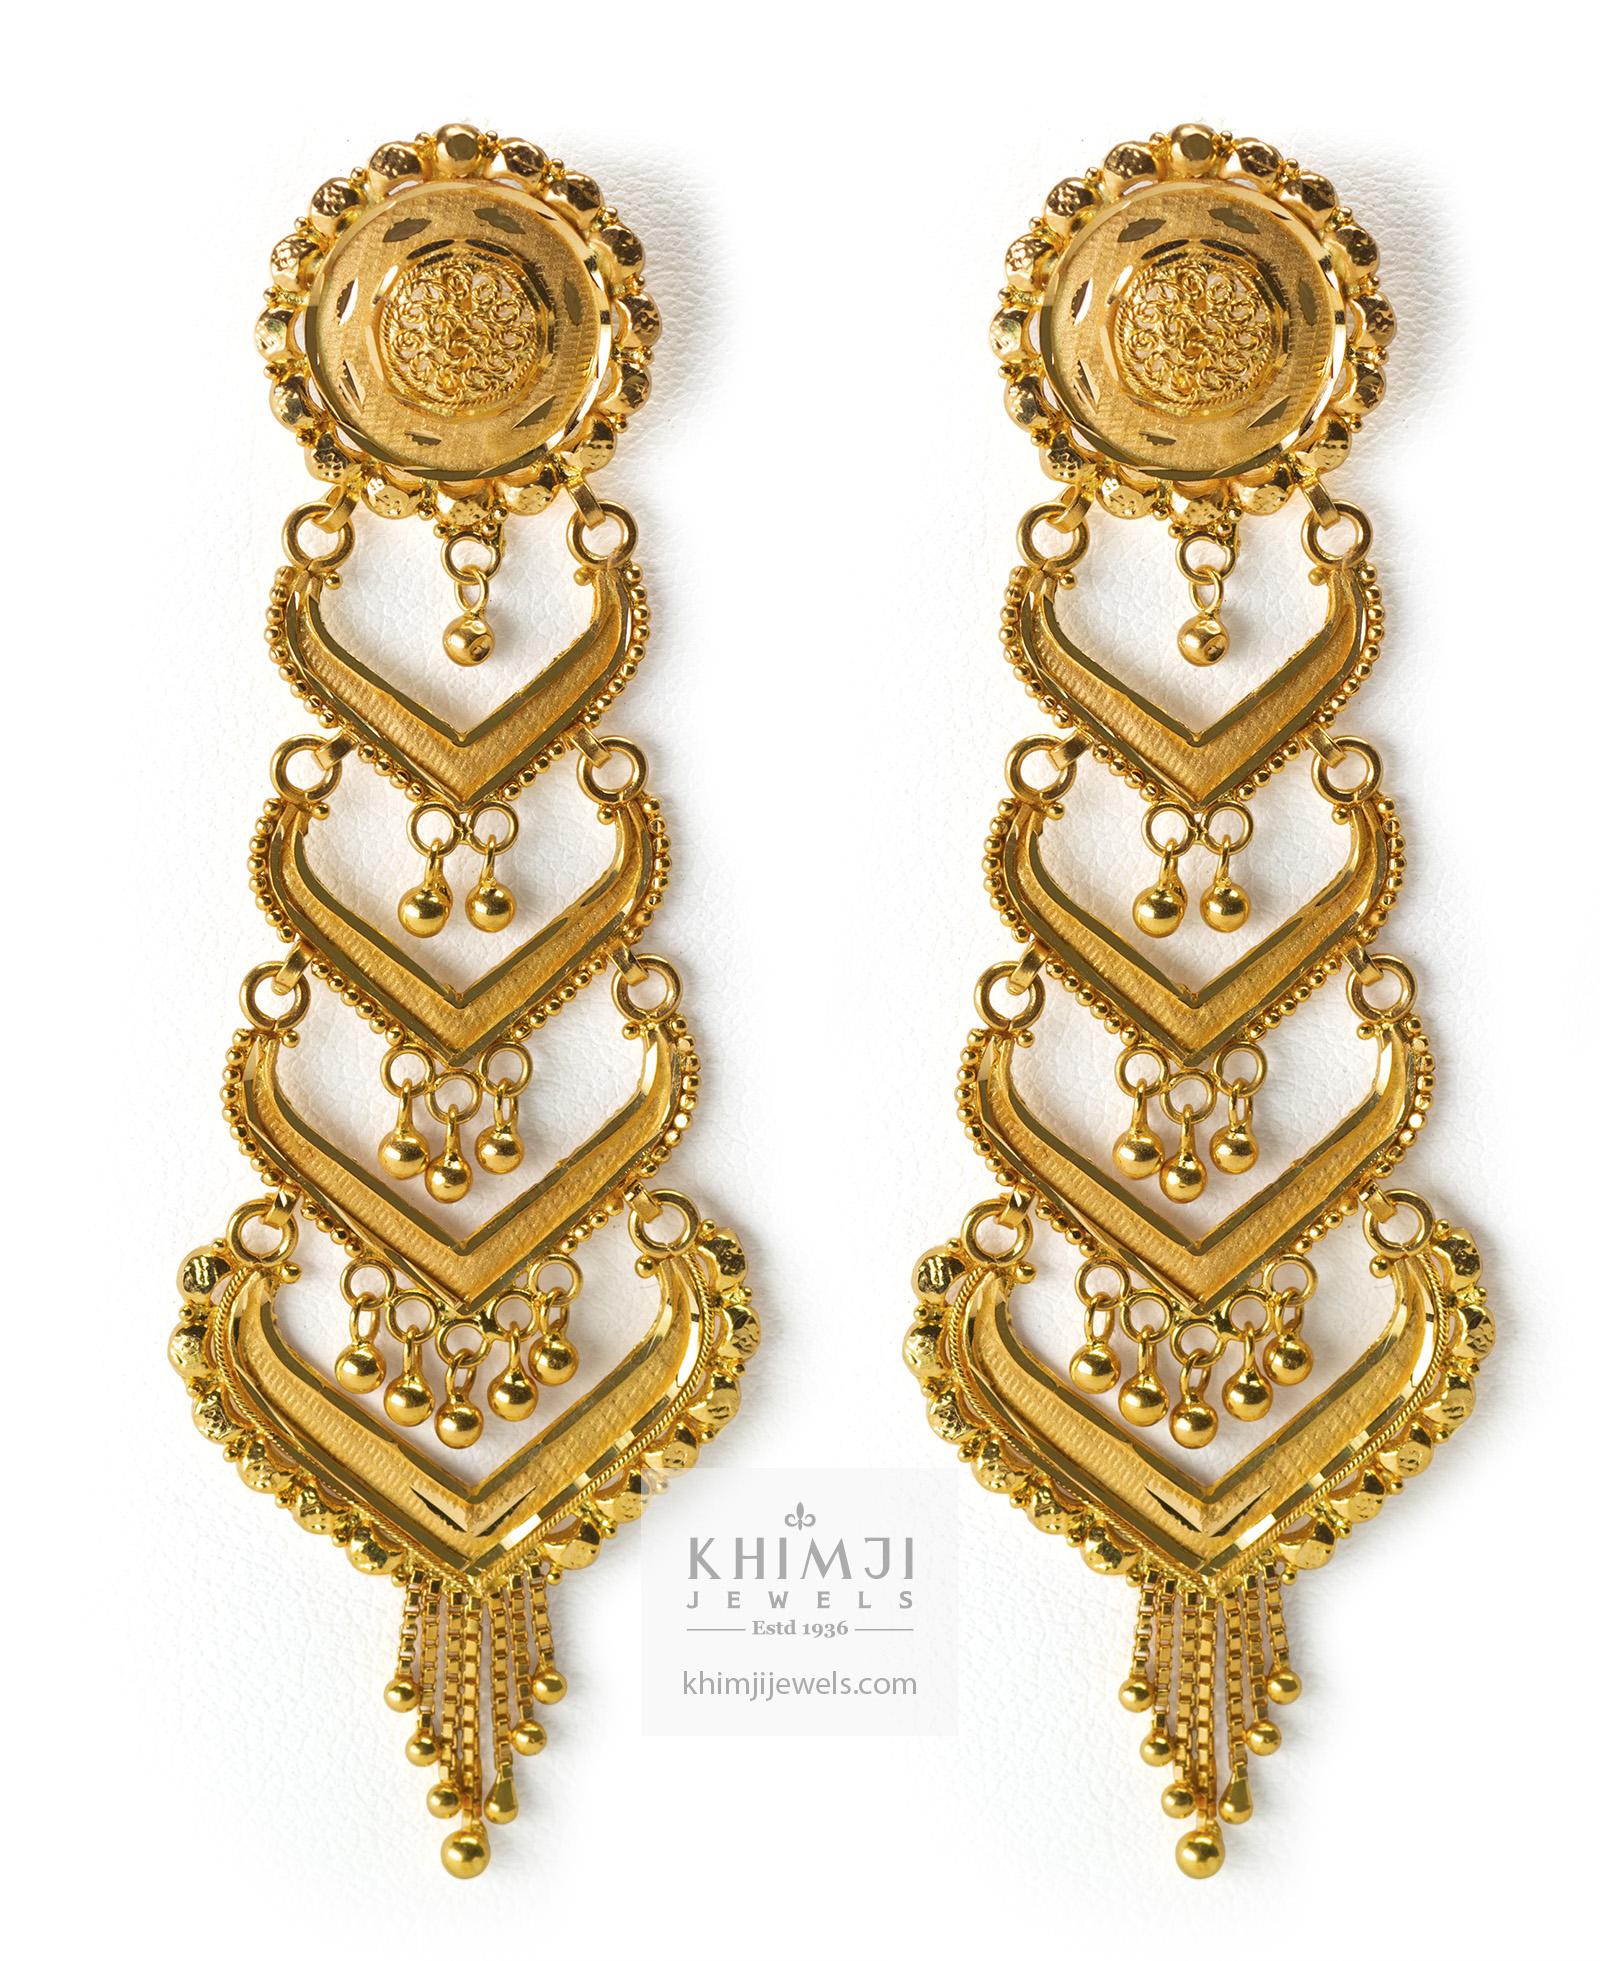 khimji-jewels